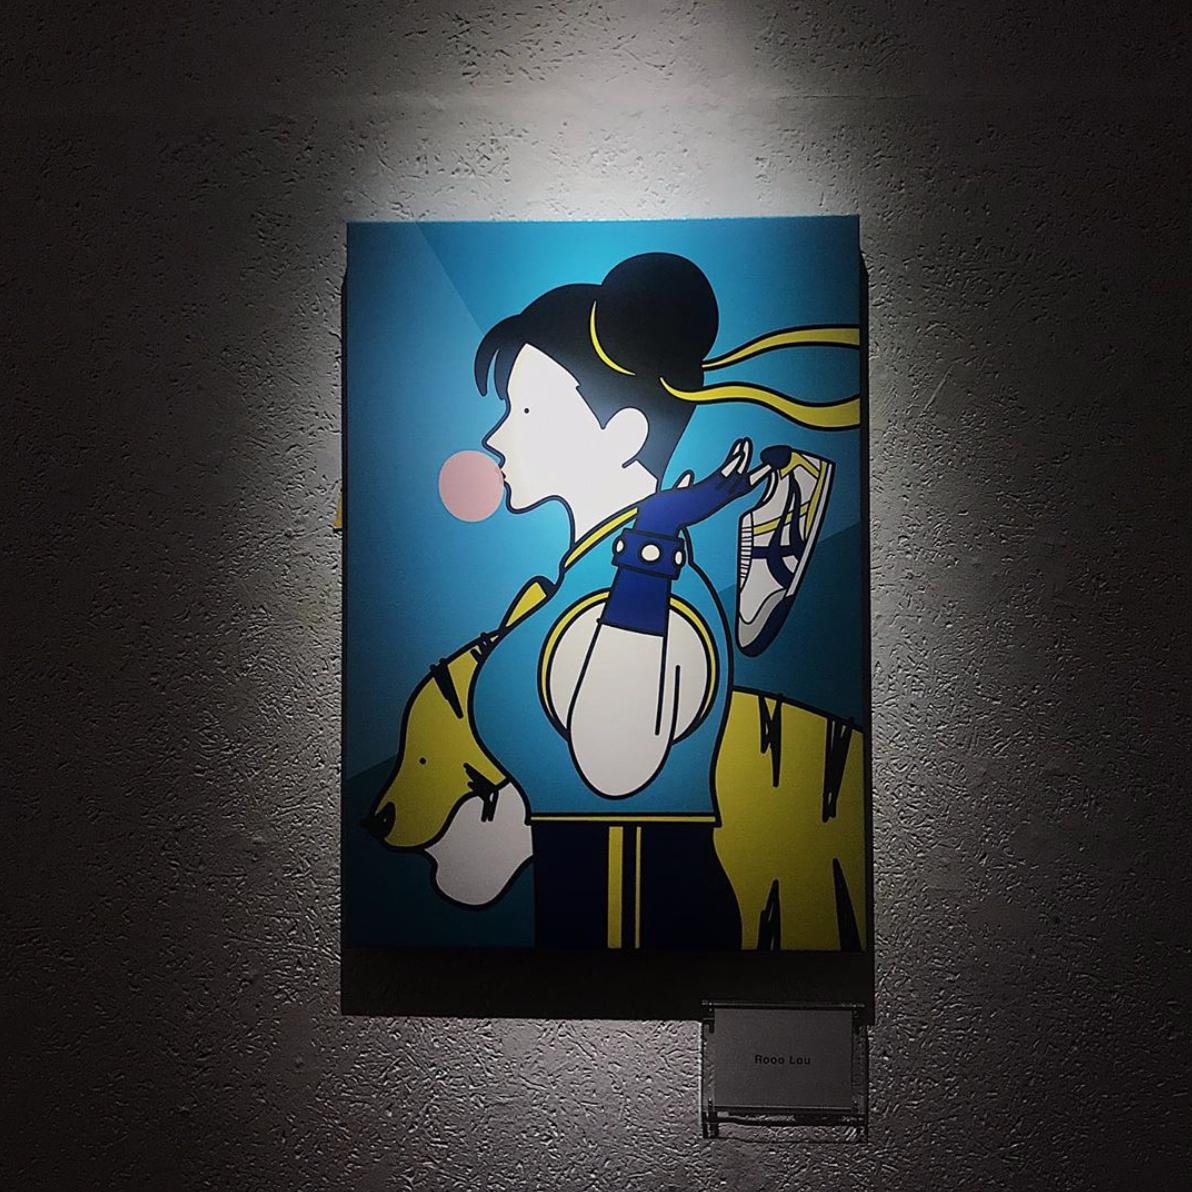 Chun-Li visual by Rooo Lou